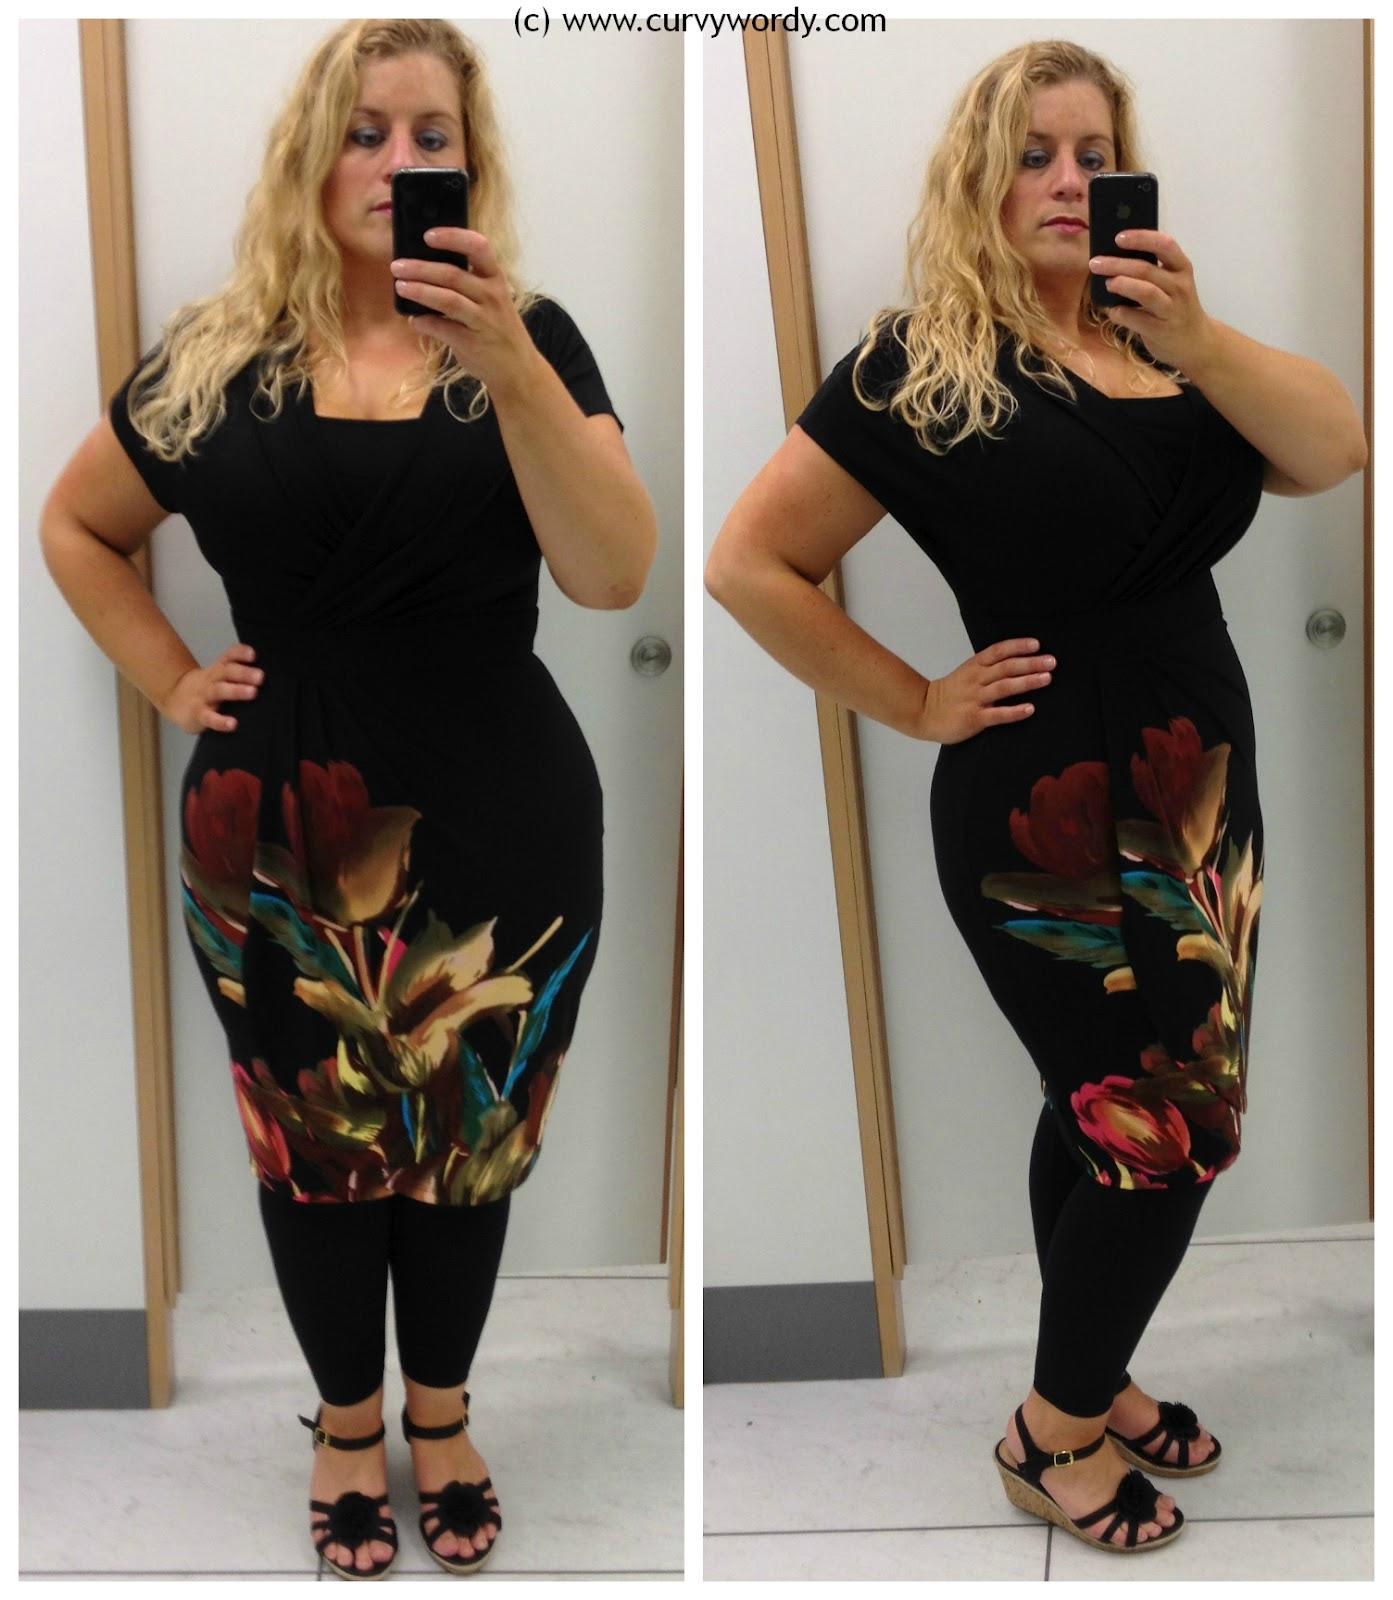 335d4486e21 M   Co Dresses  Summer 2012 - Curvy Wordy